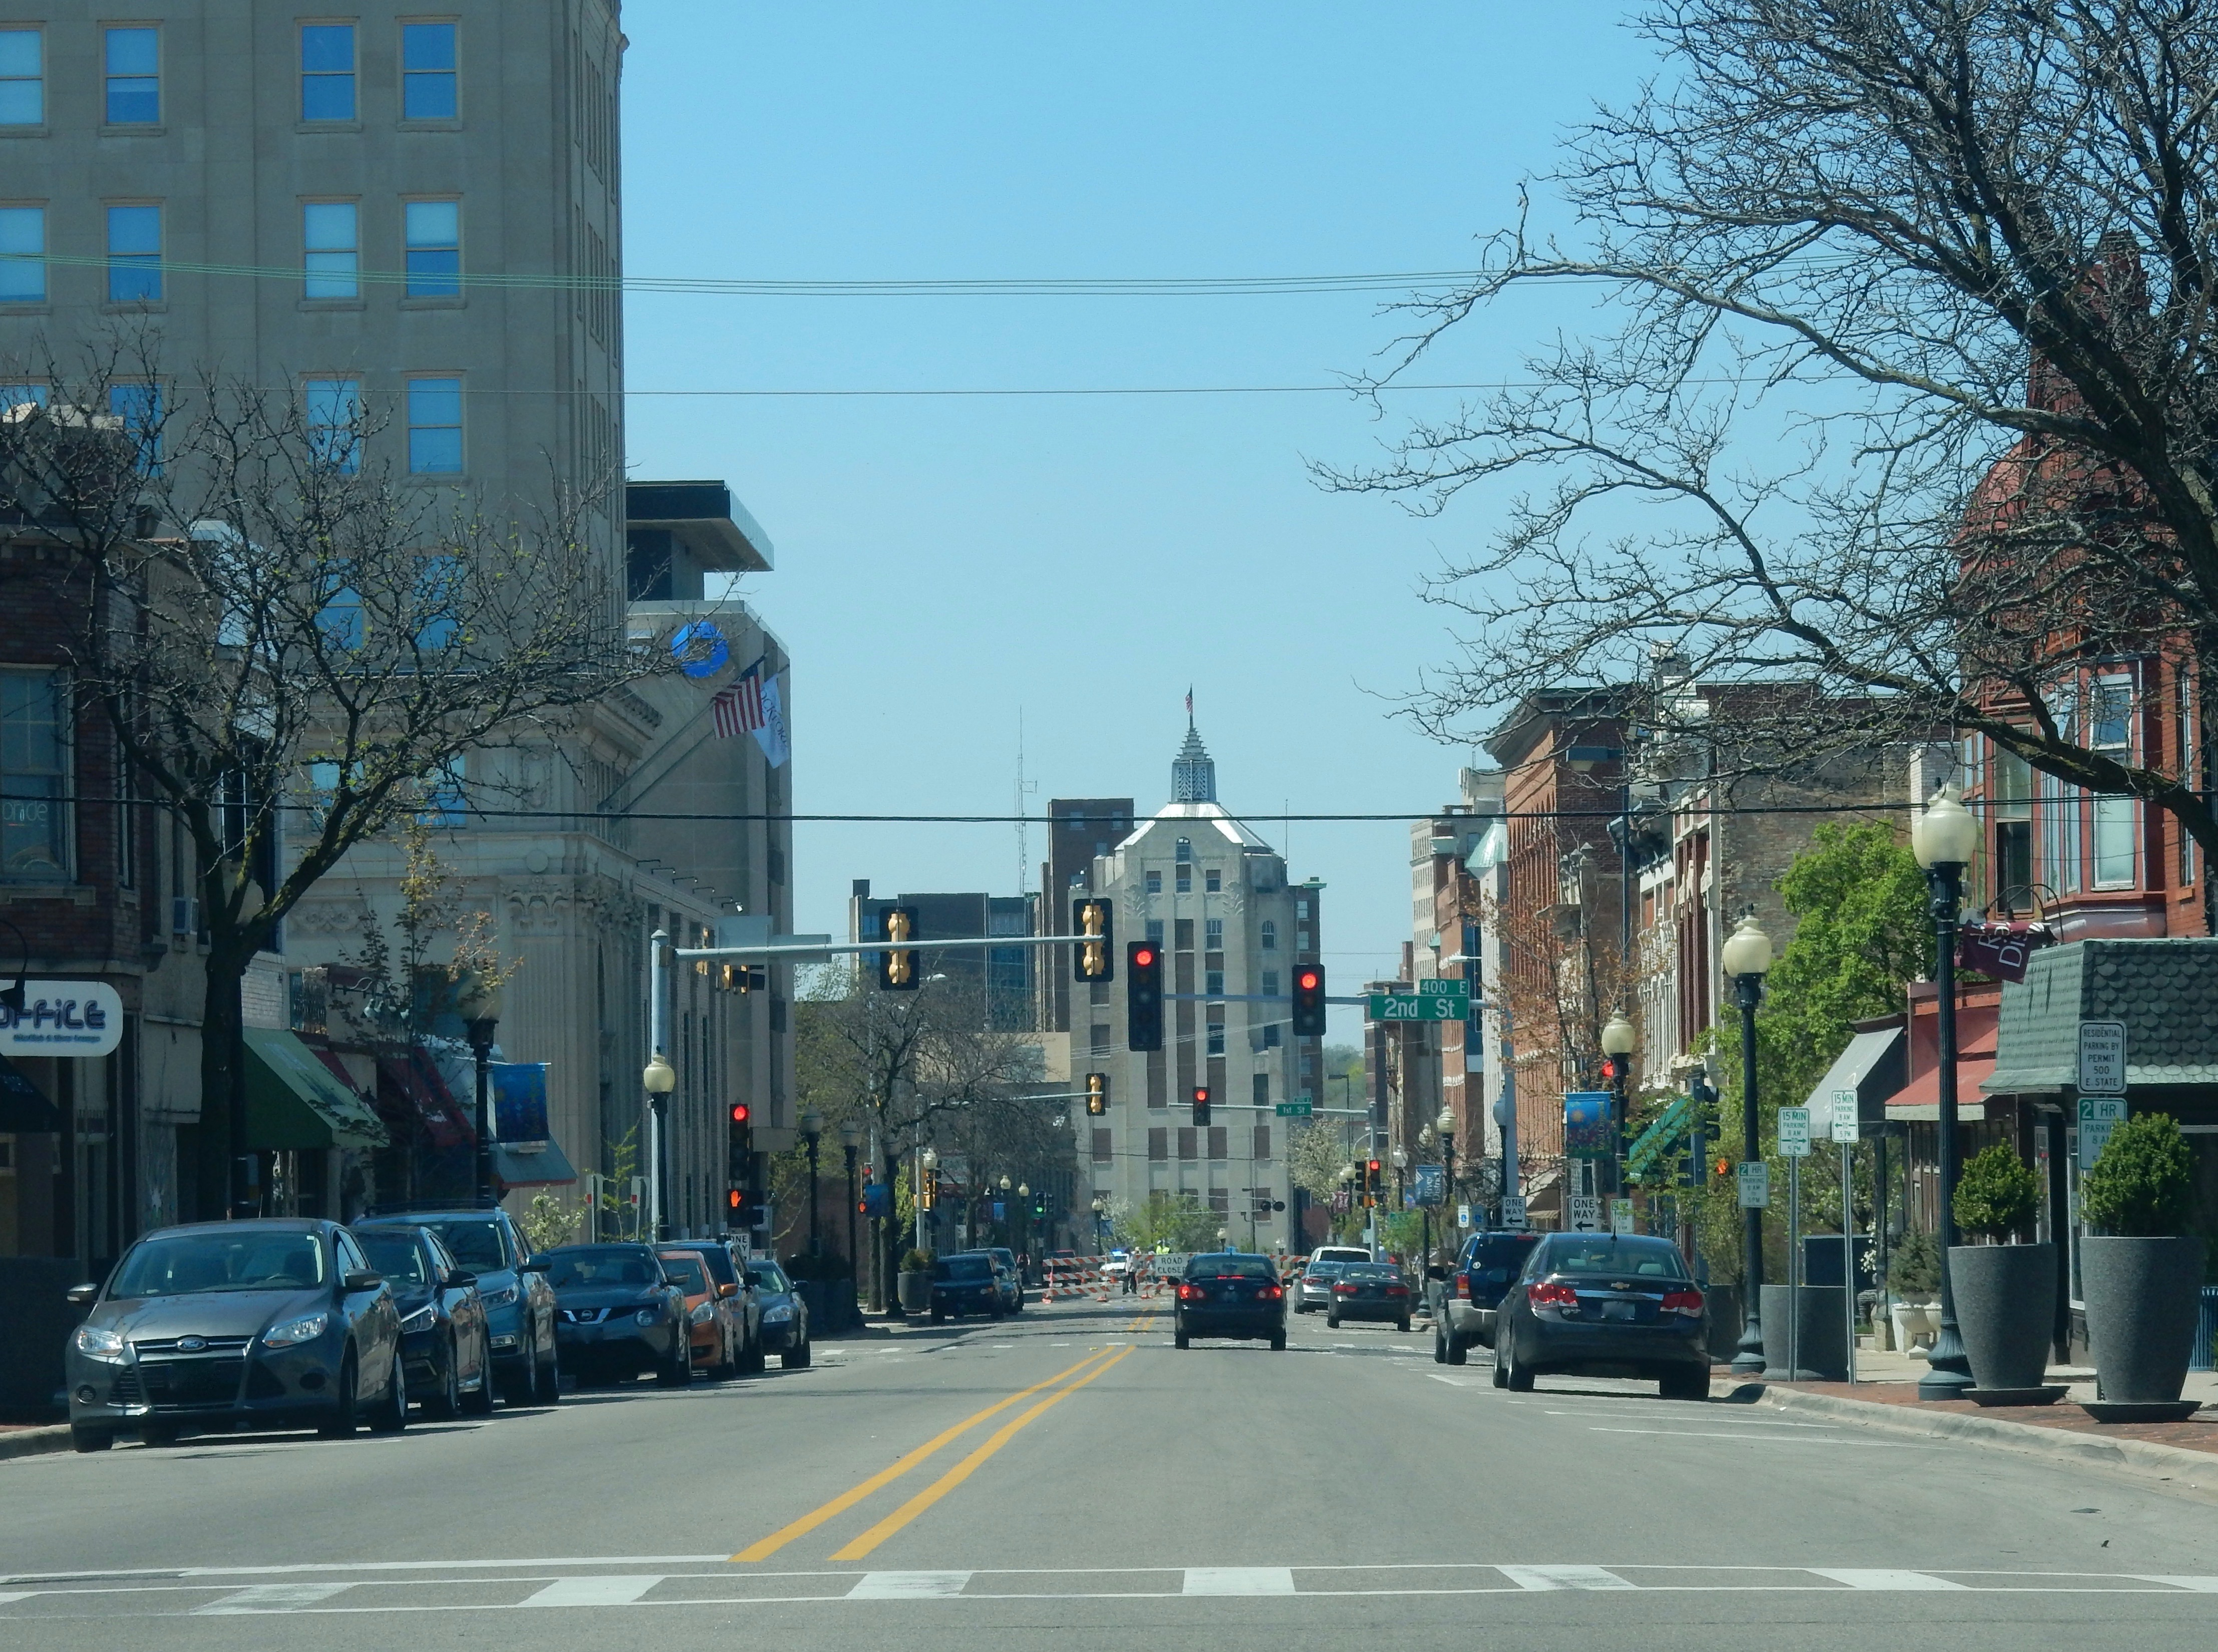 Downtown Rockford, Illinois